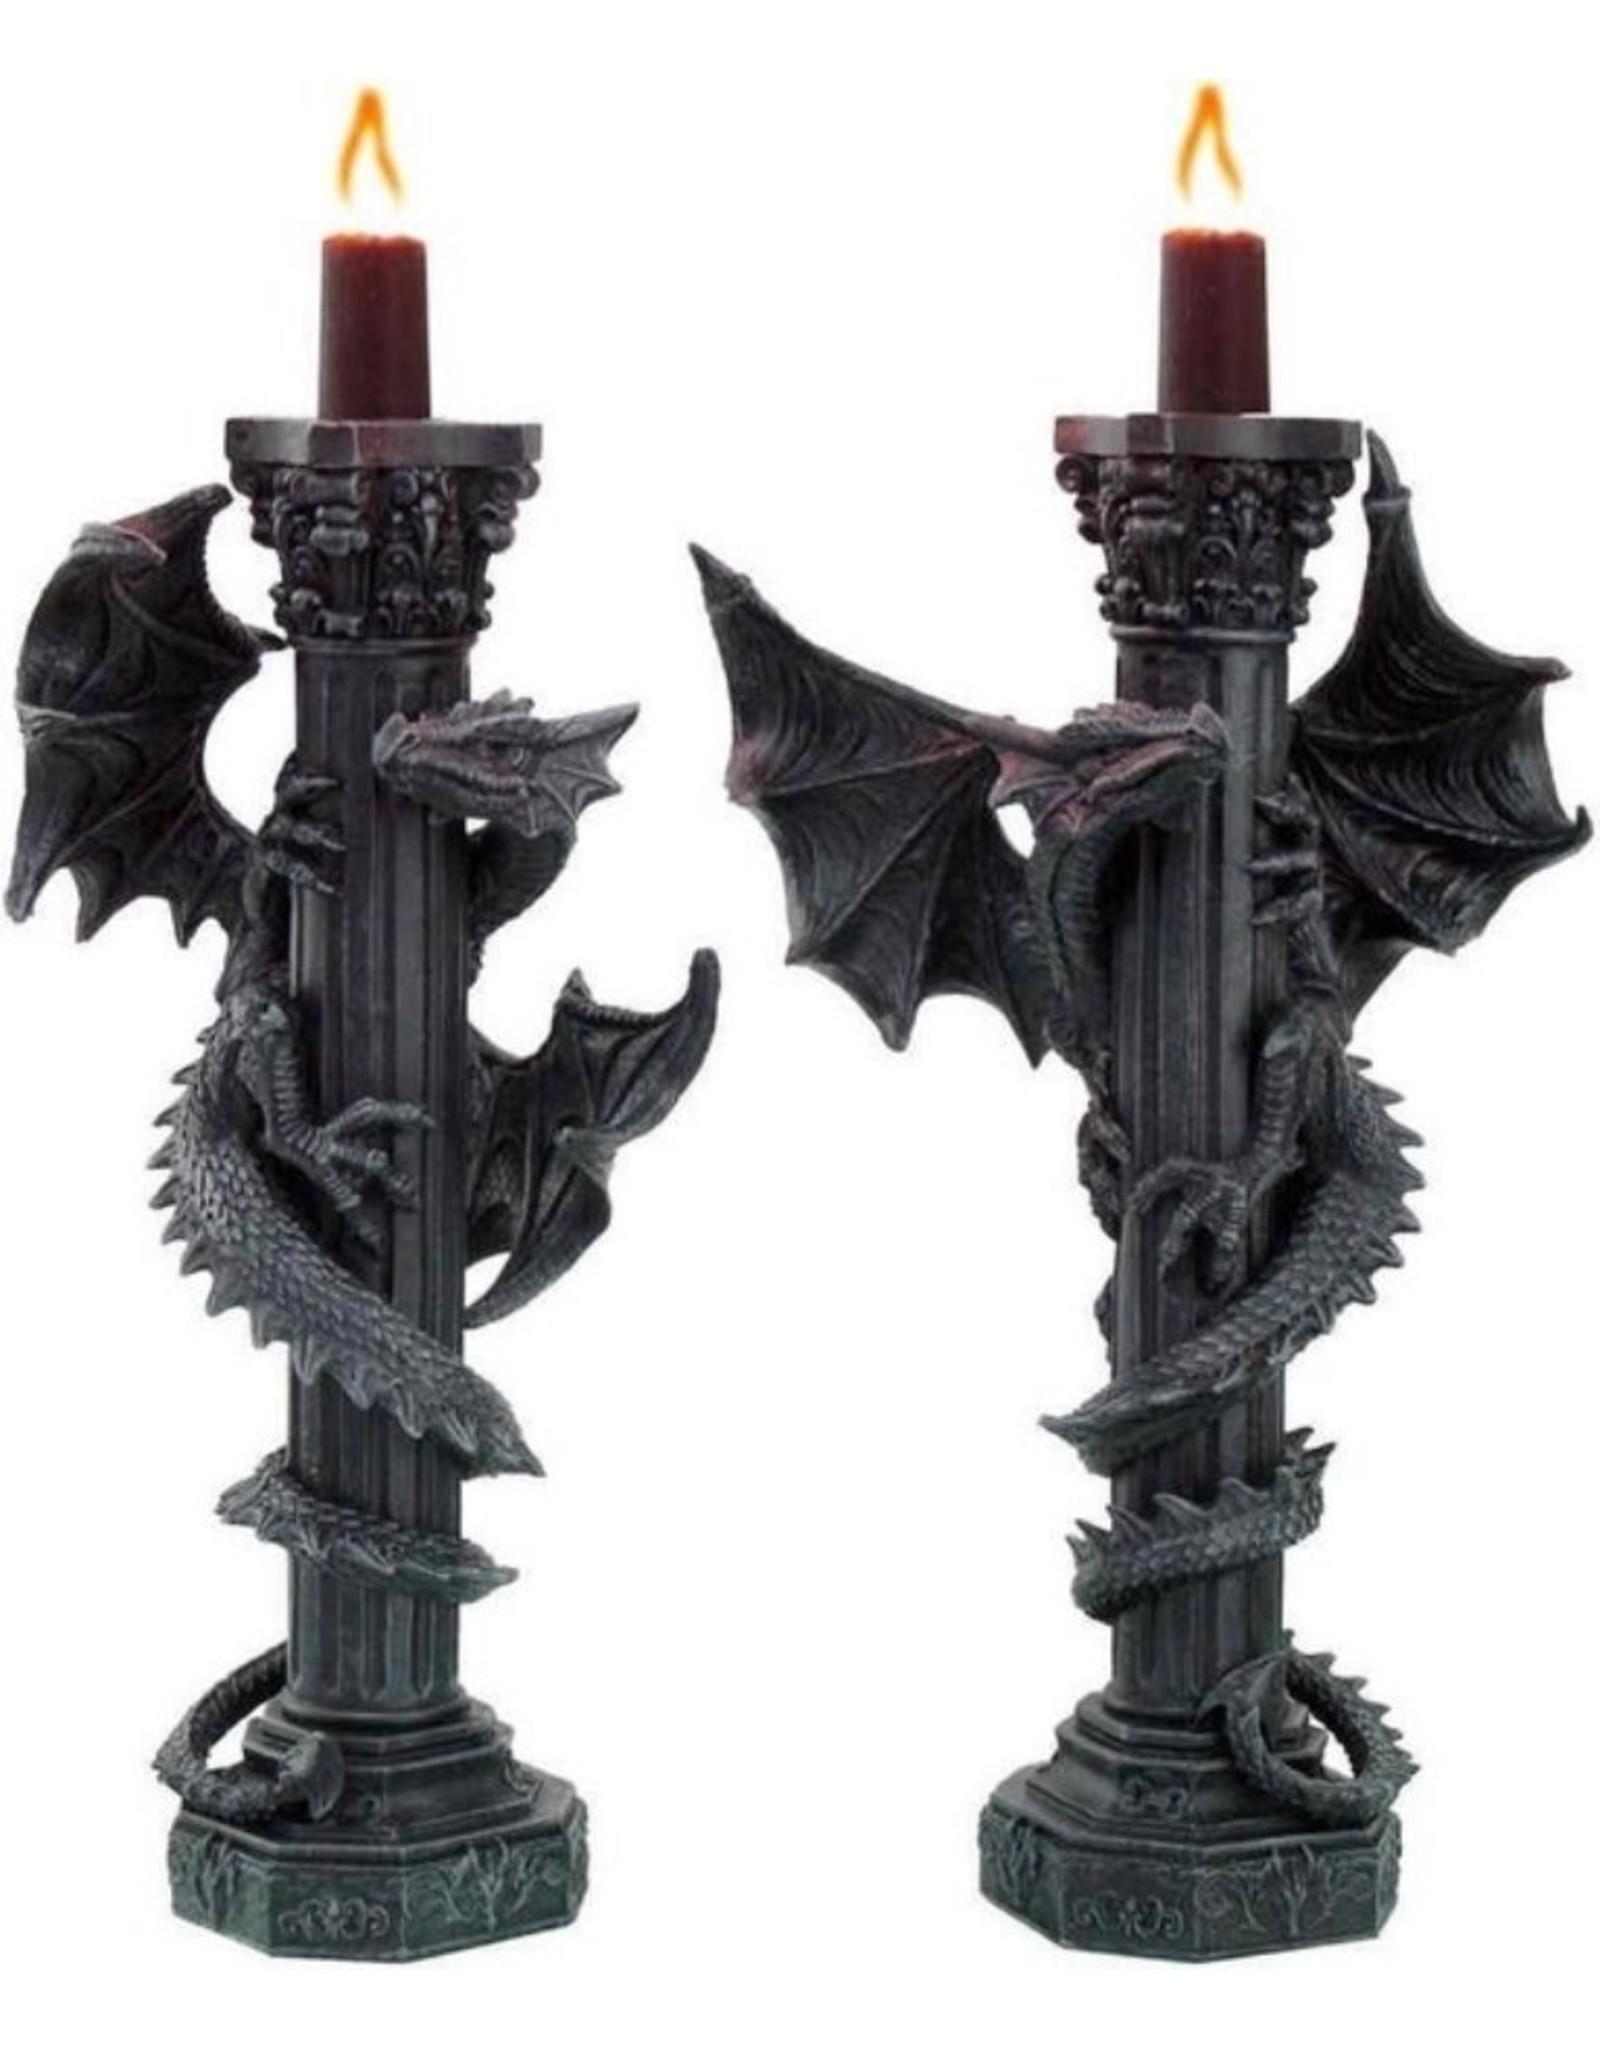 Nemesis Now Giftware & Lifestyle - Guardians of the Light Draken kandelaar set Nemesis Now